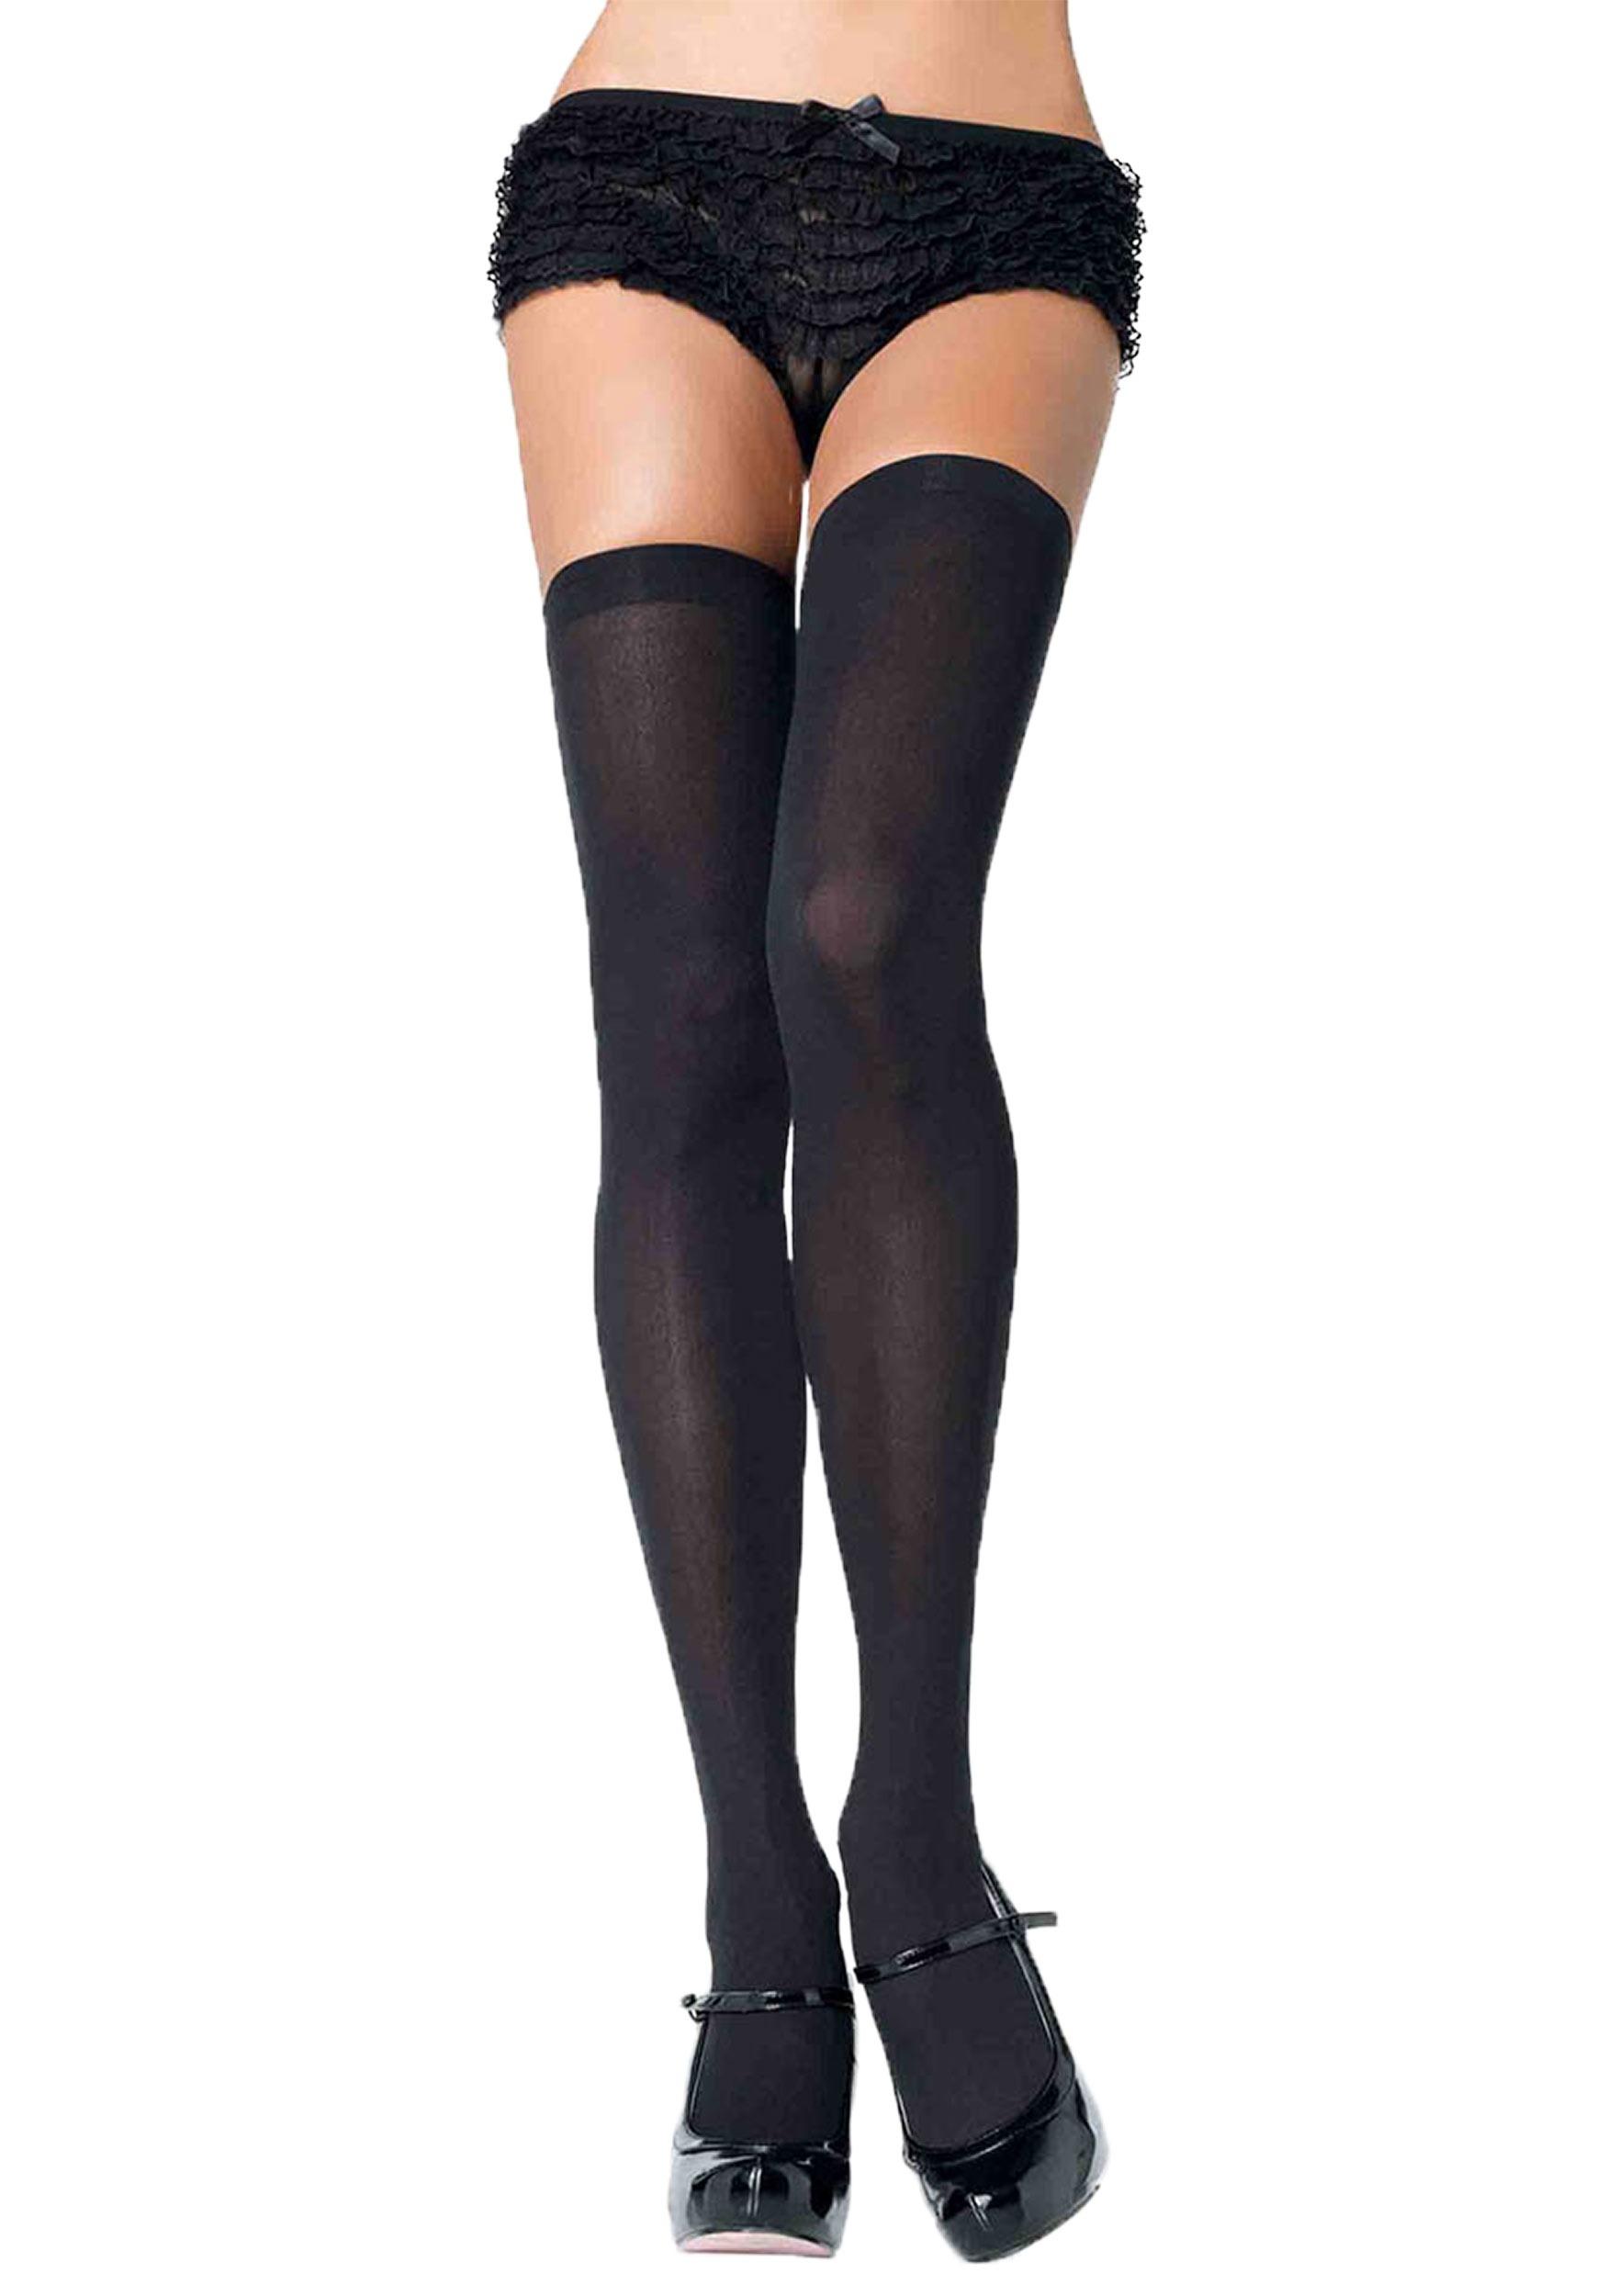 Black Thigh Length Stockings - Nylon Stockings 805534c8d2